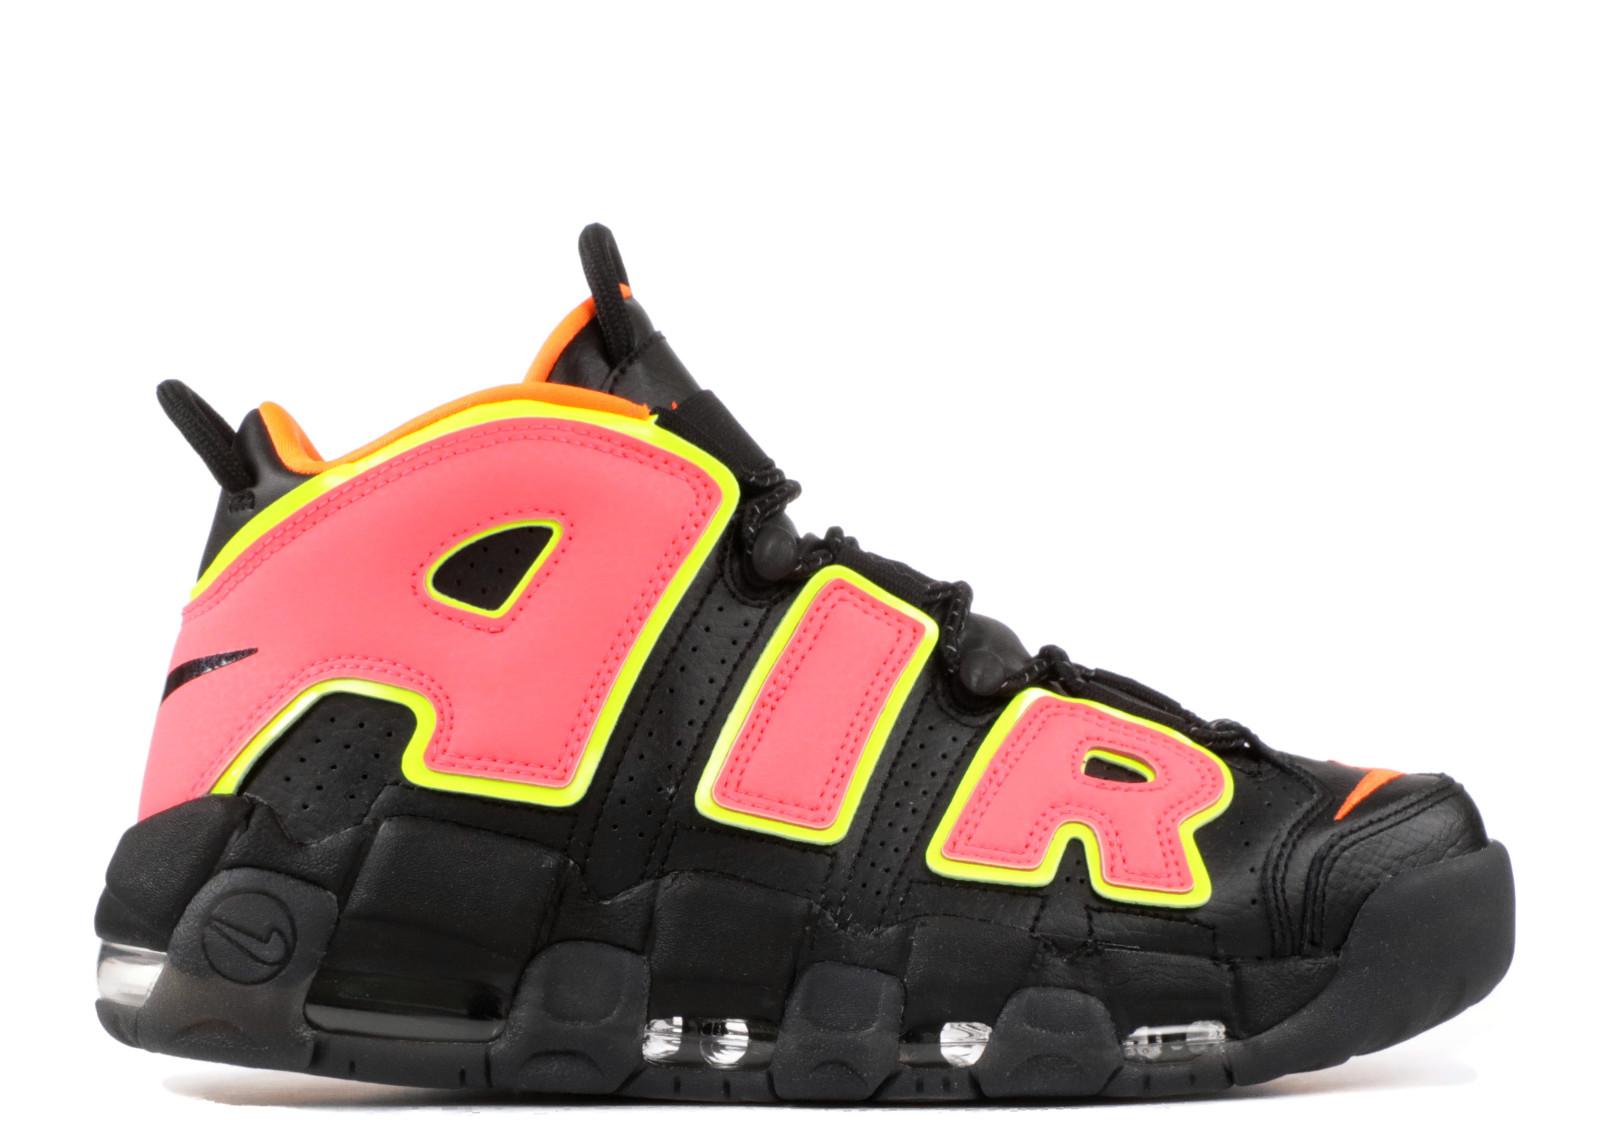 56cbe688050 Nike Air More Uptempo Pink Pinch Hot Black Volt 917593-002 - Febbuy